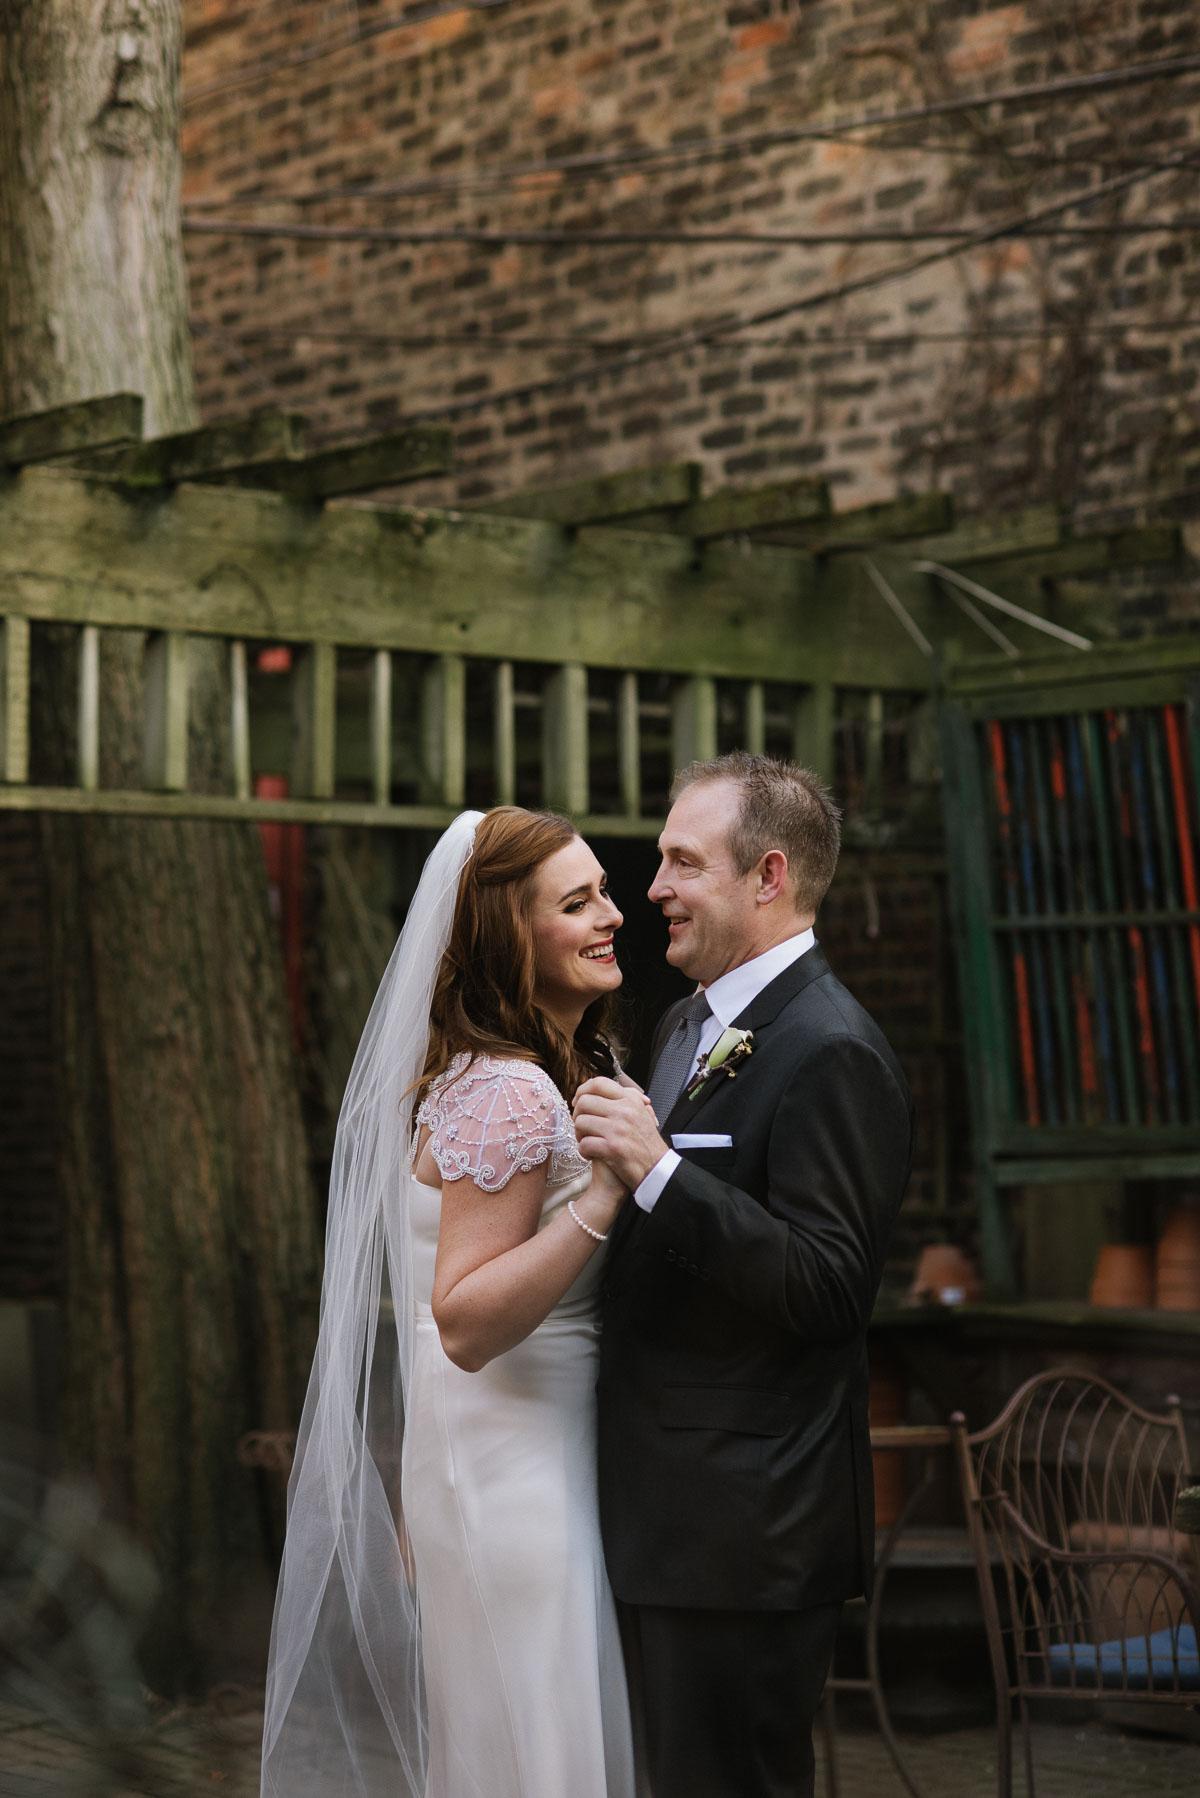 Pamela Yasuko Photography - A New Leaf Wedding - Chicago Oahu Photographer-34.jpg